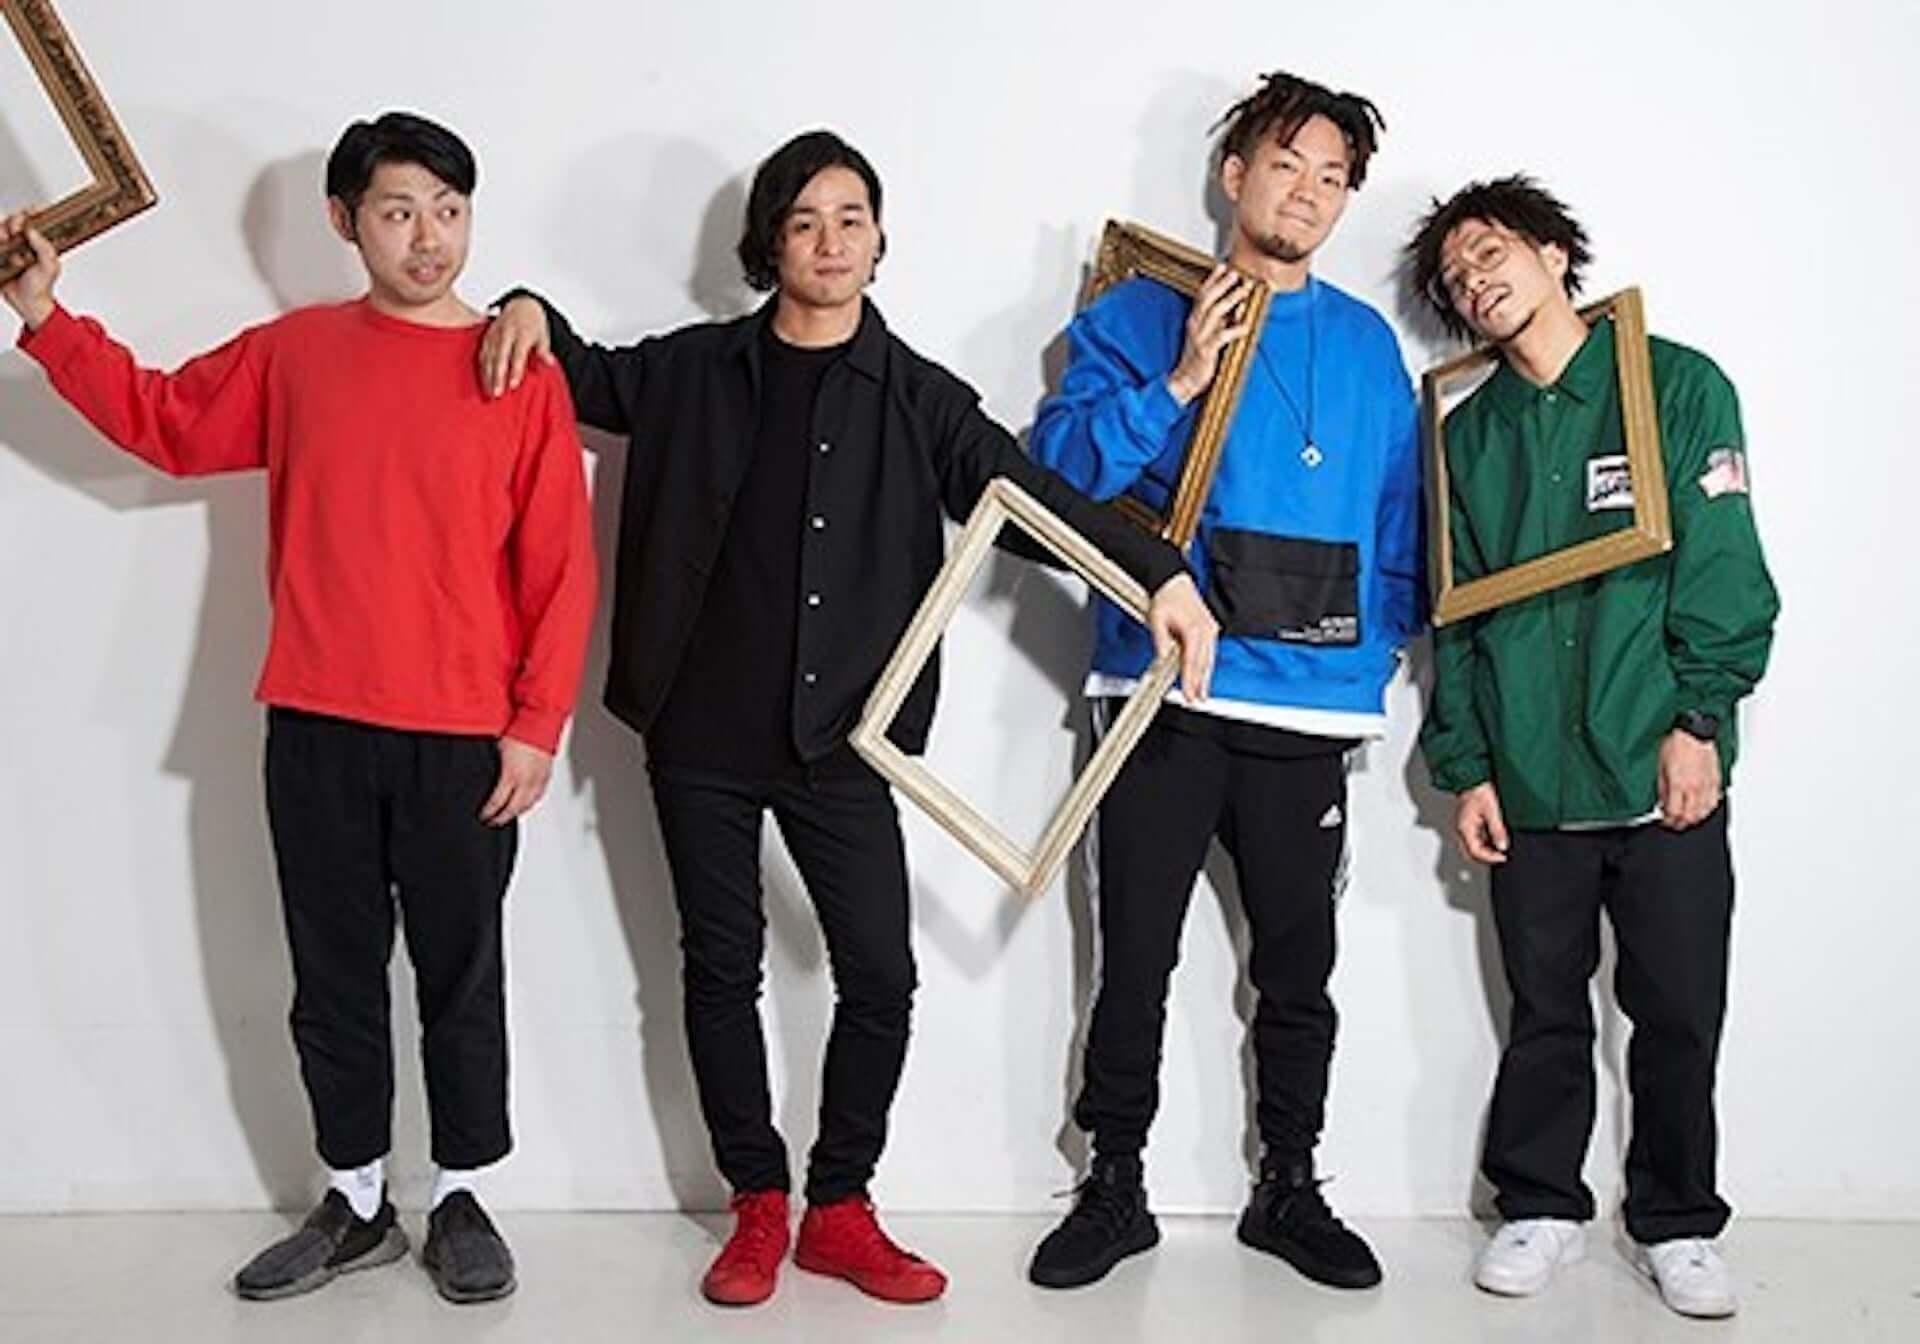 FNCY、Kenmochi Hidefumiなどが出演|<SYNCHRONICITY>企画のオールナイトパーティーが開催 music190725synchronicity_6-1920x1344